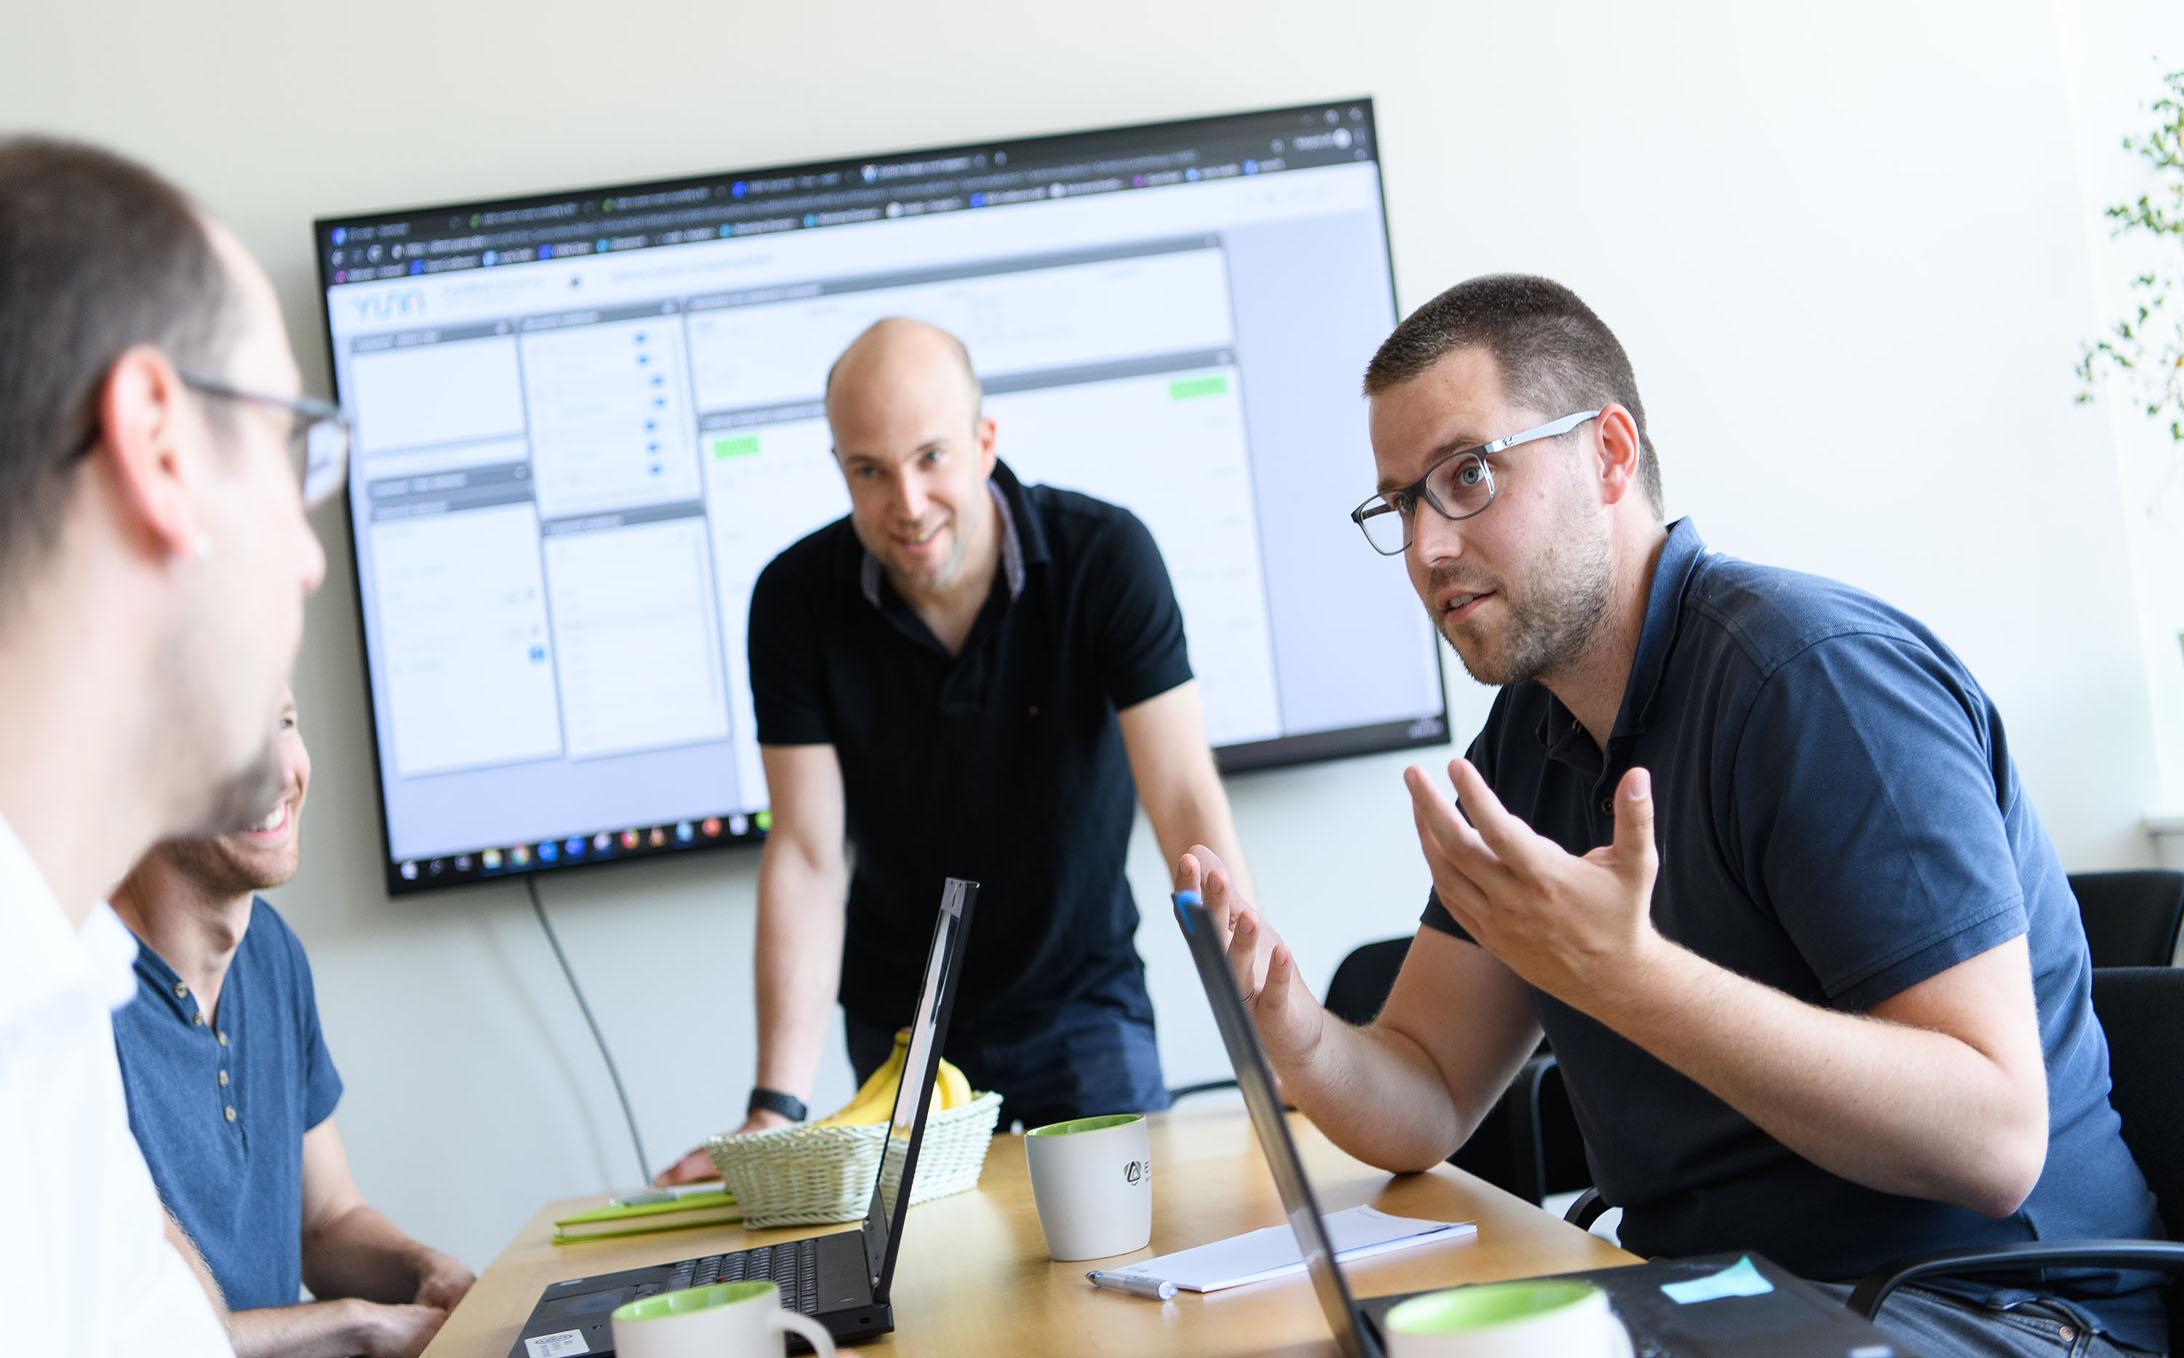 Personen besprechen sich bei der Softwareentwicklung